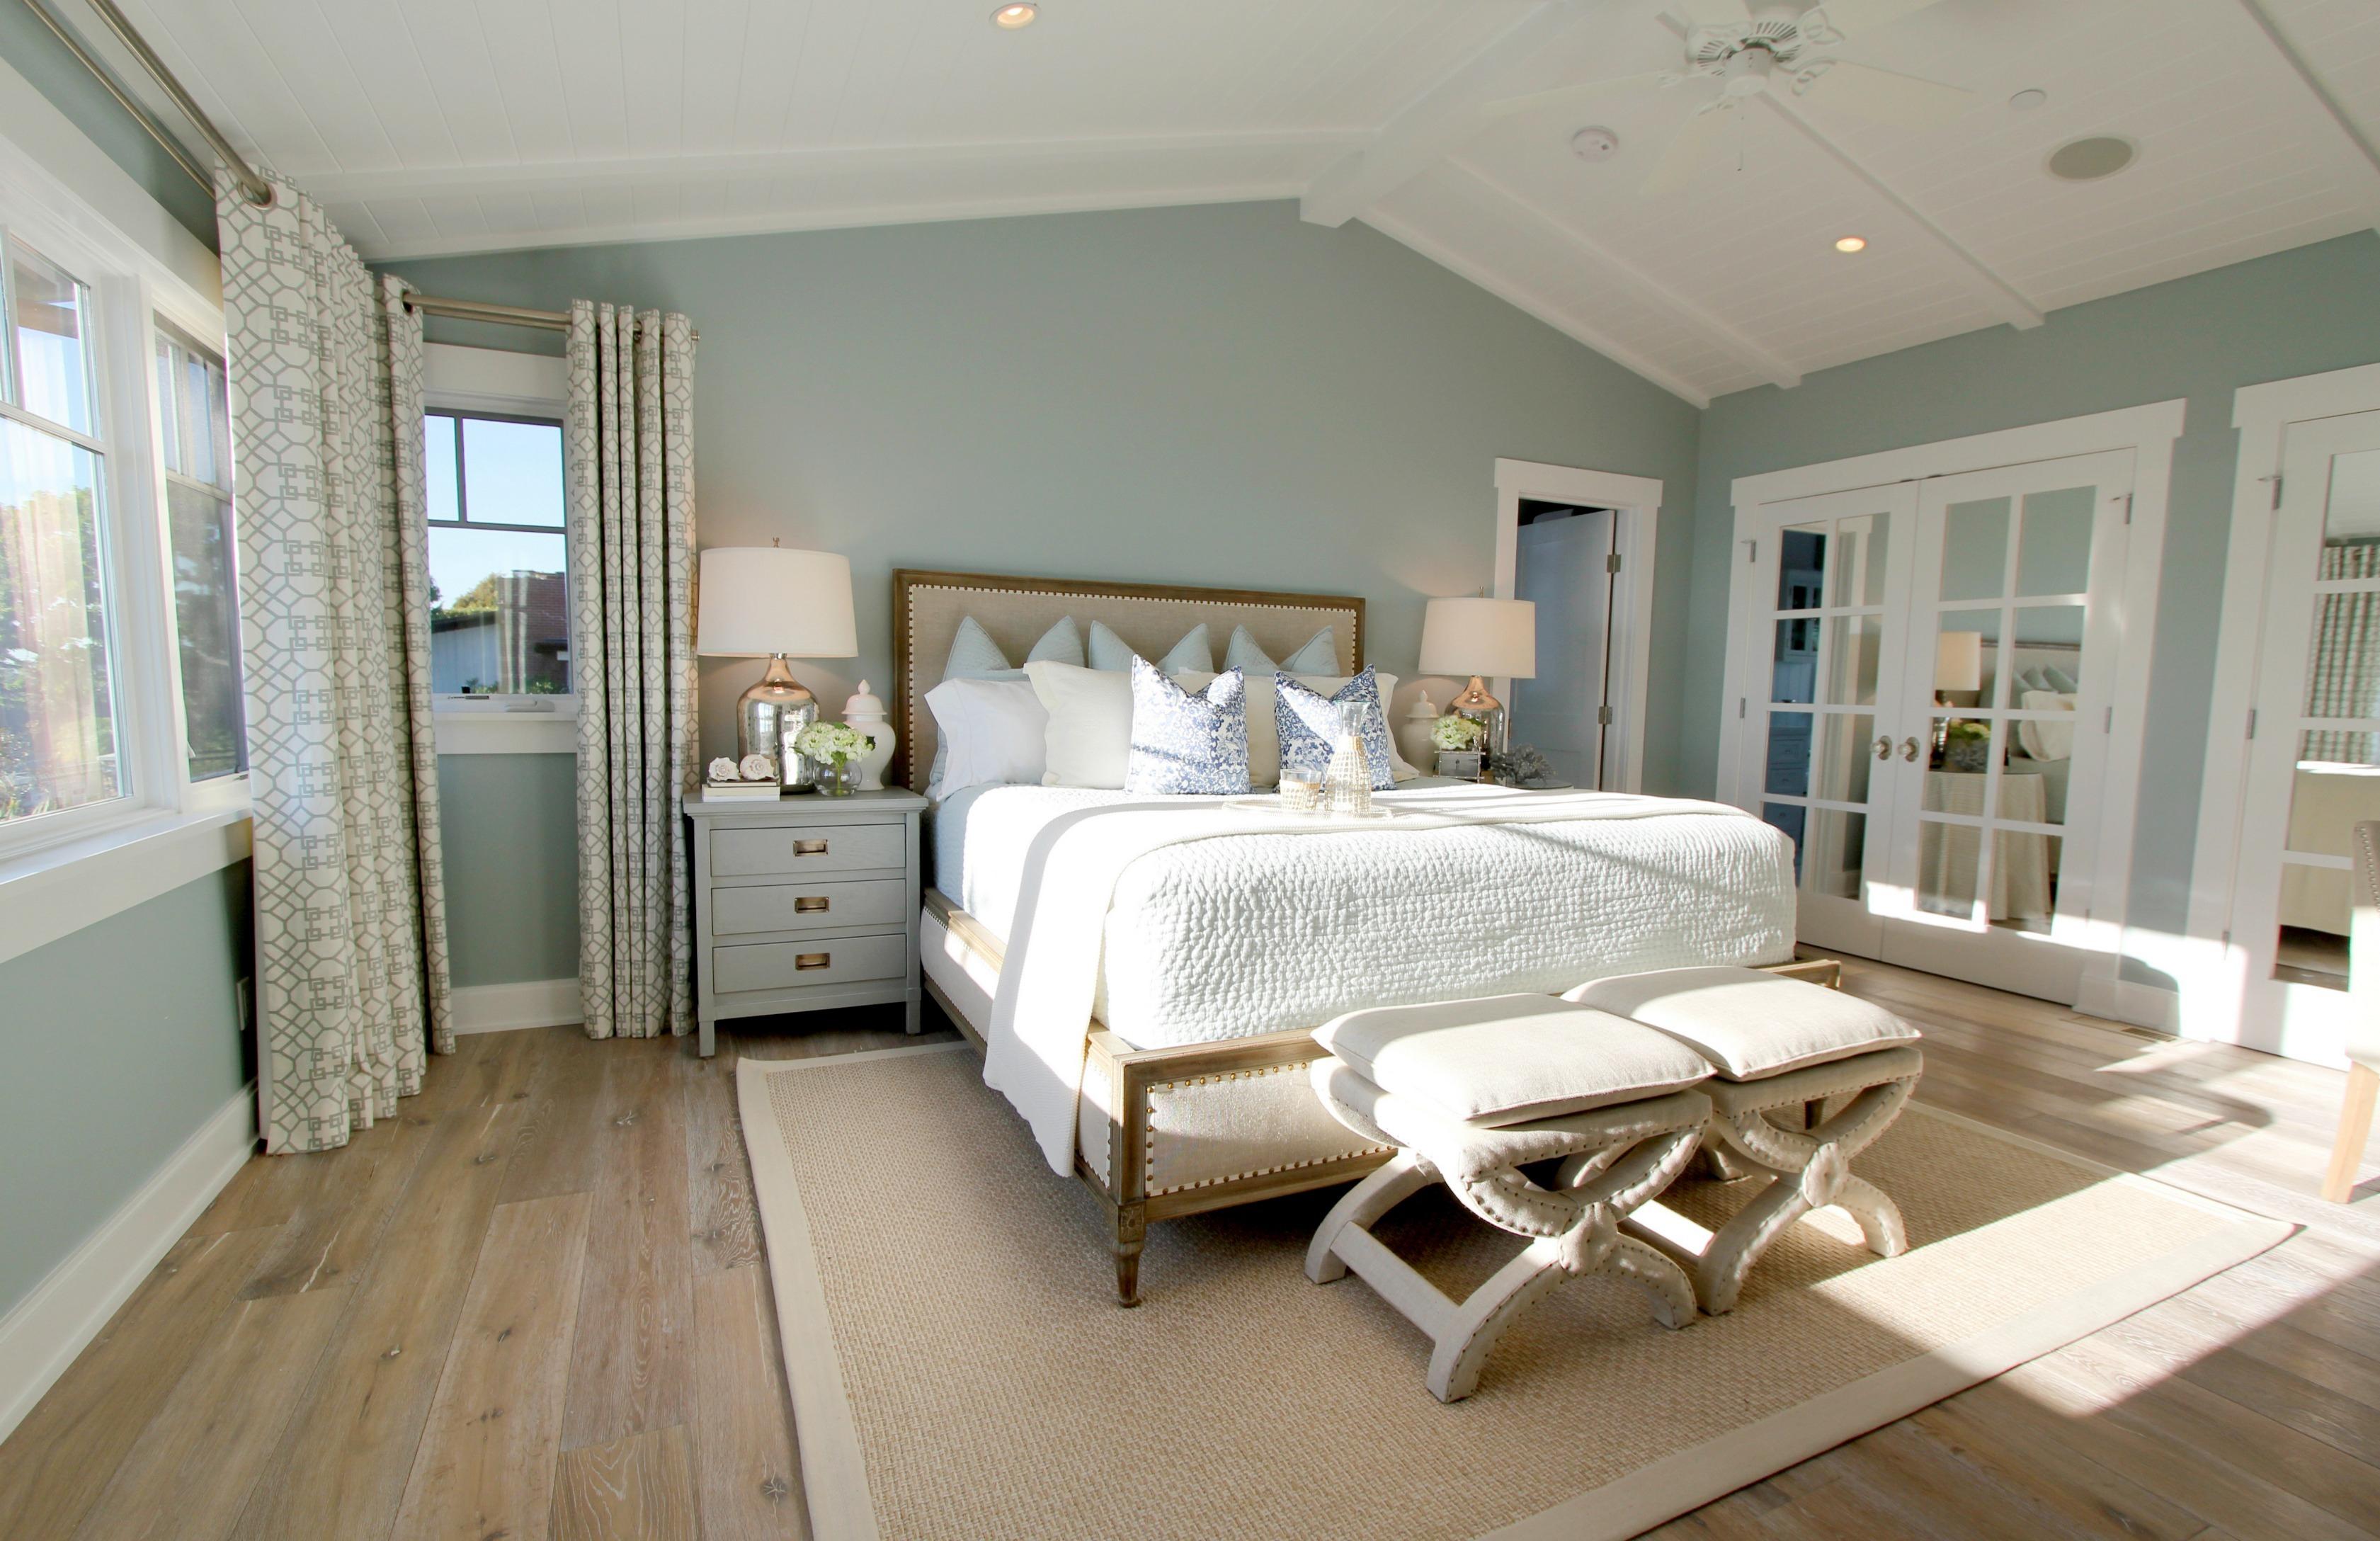 Bedroom Paint Color Trends For 2017 Better Homes Gardens inside measurements 3361 X 2176